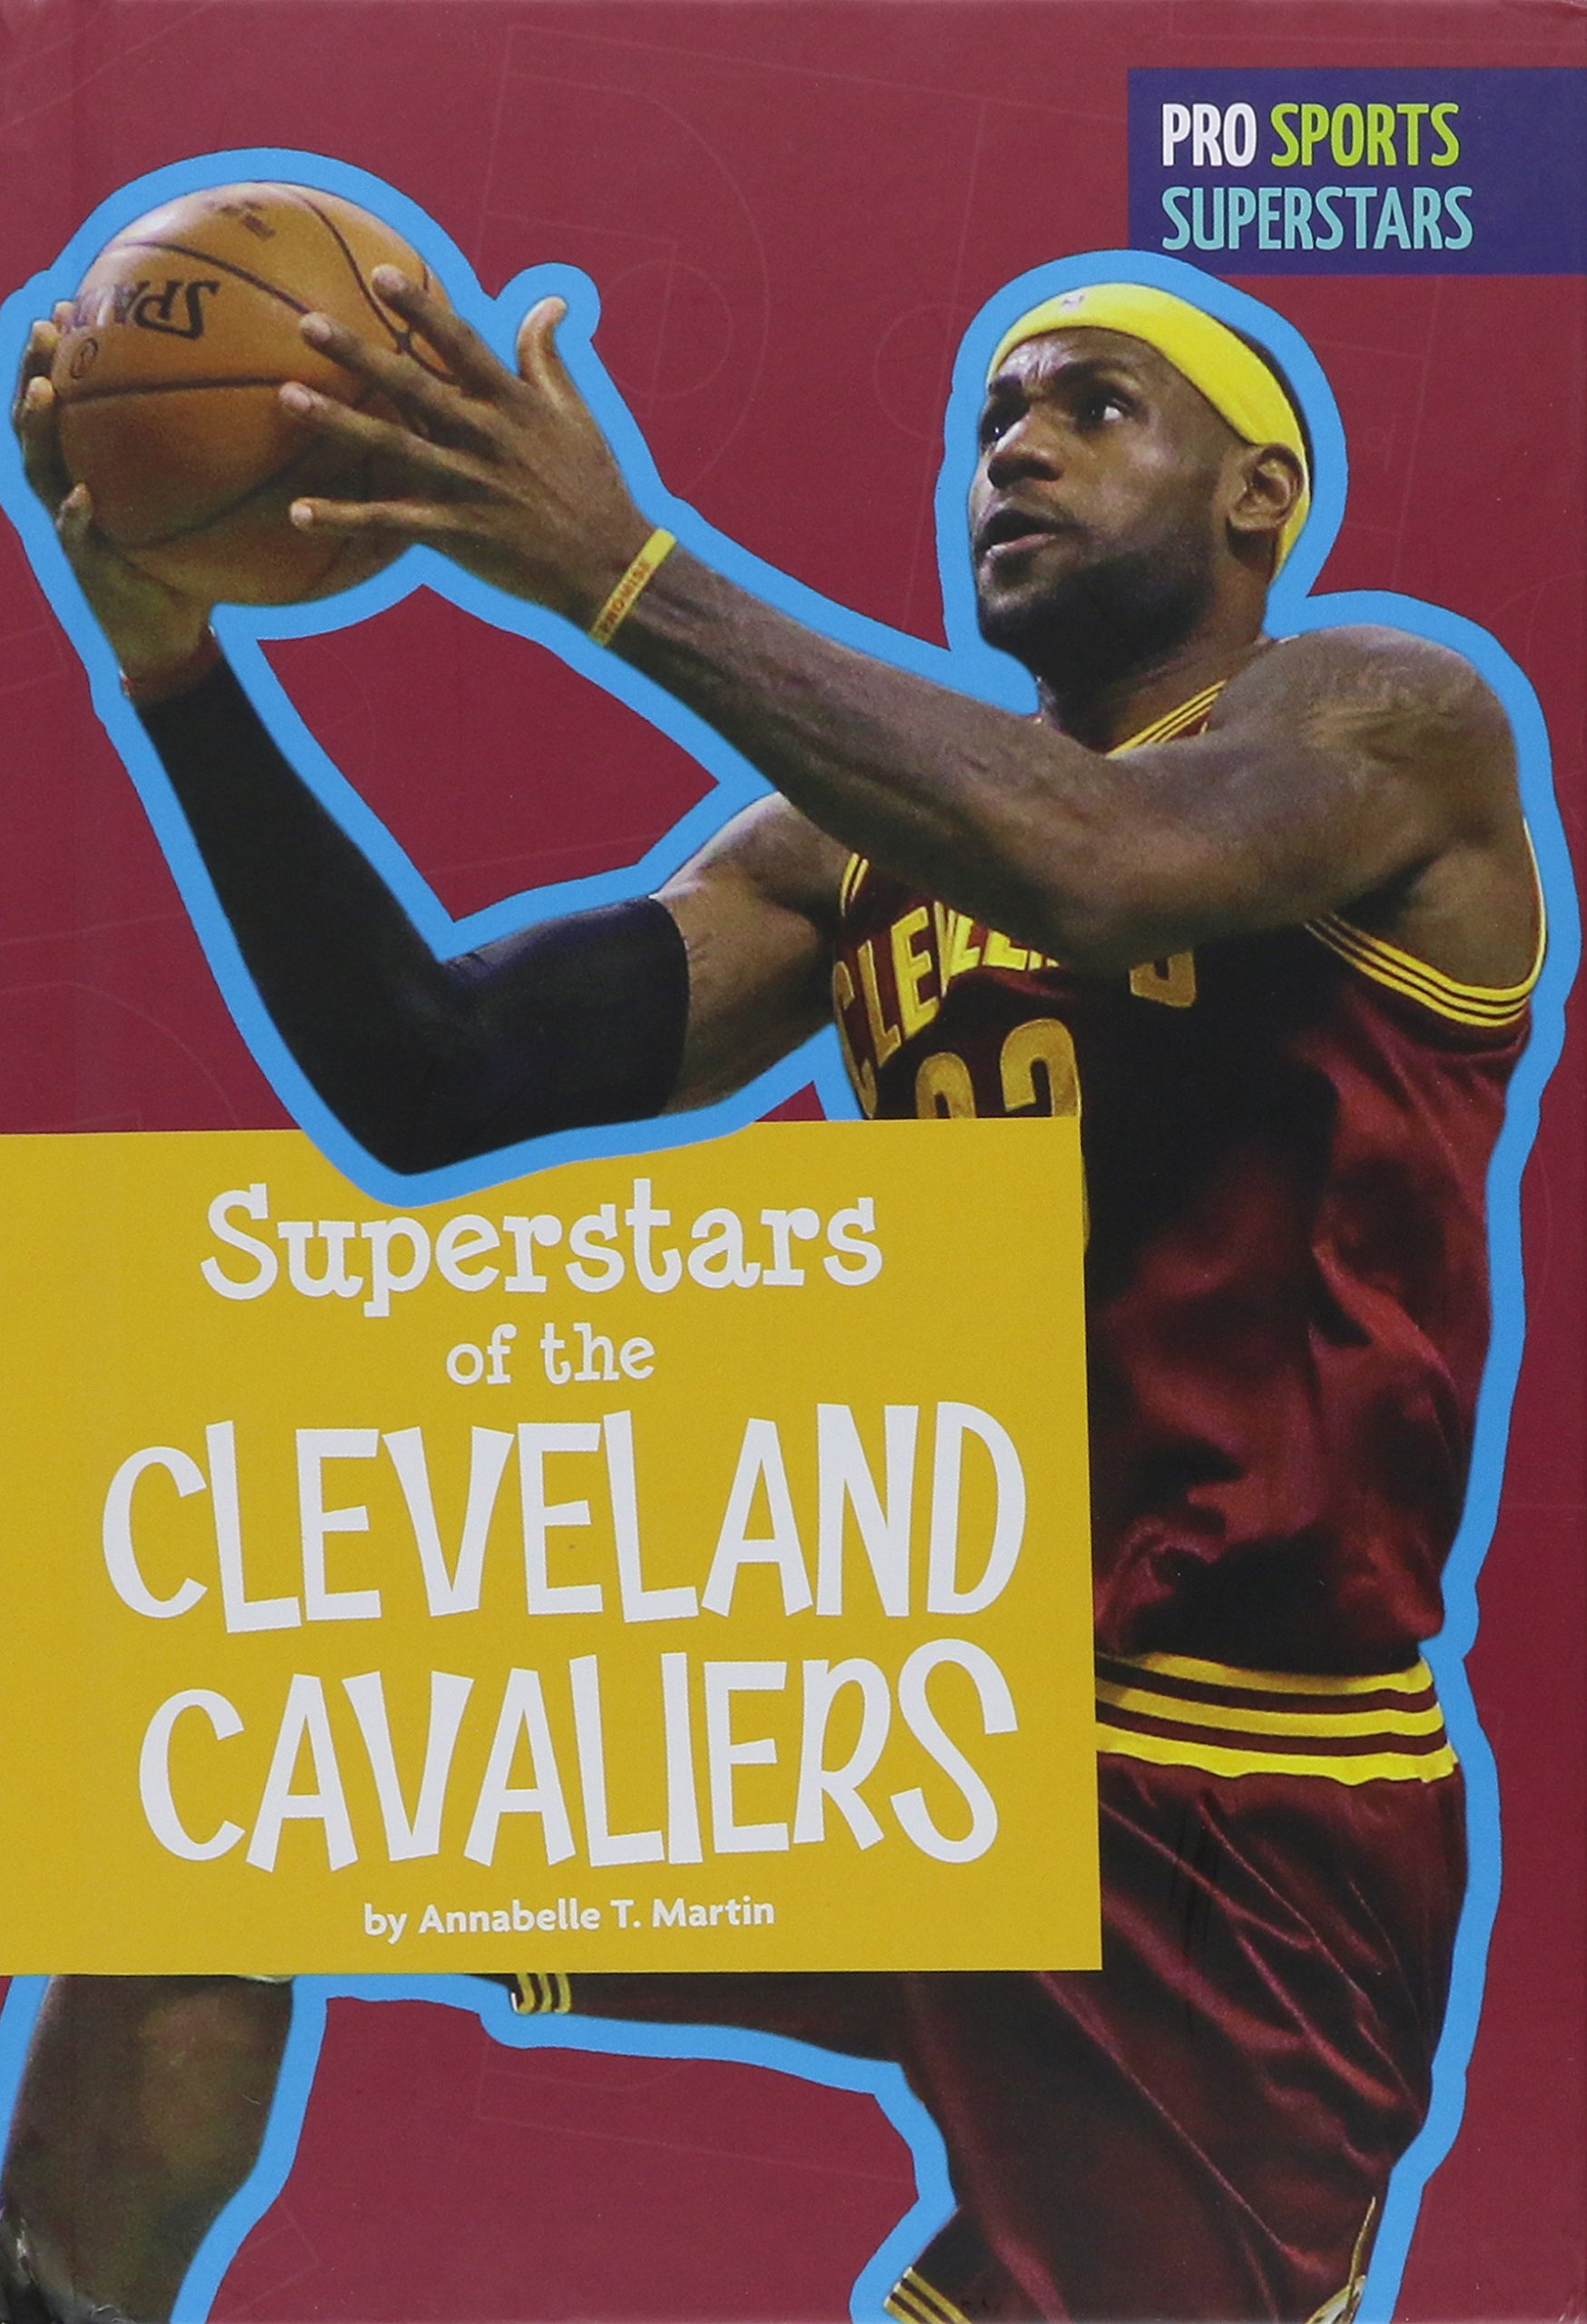 Superstars of the Cleveland Cavaliers (Pro Sports Superstars: NBA)